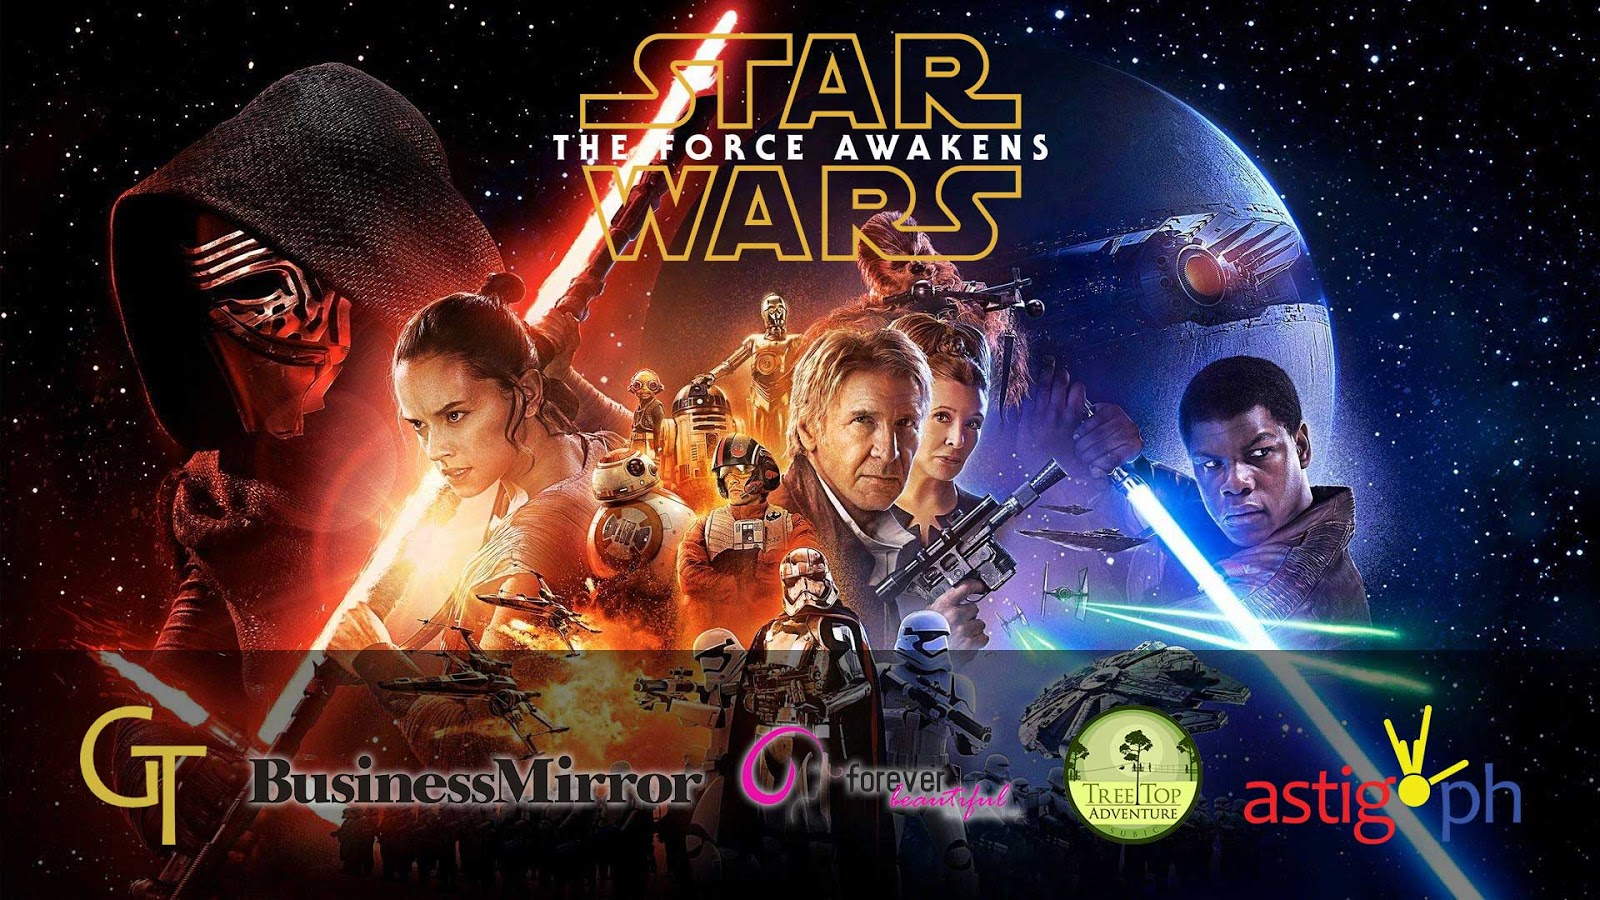 star-wars-the-force-awakens-golden-ticket